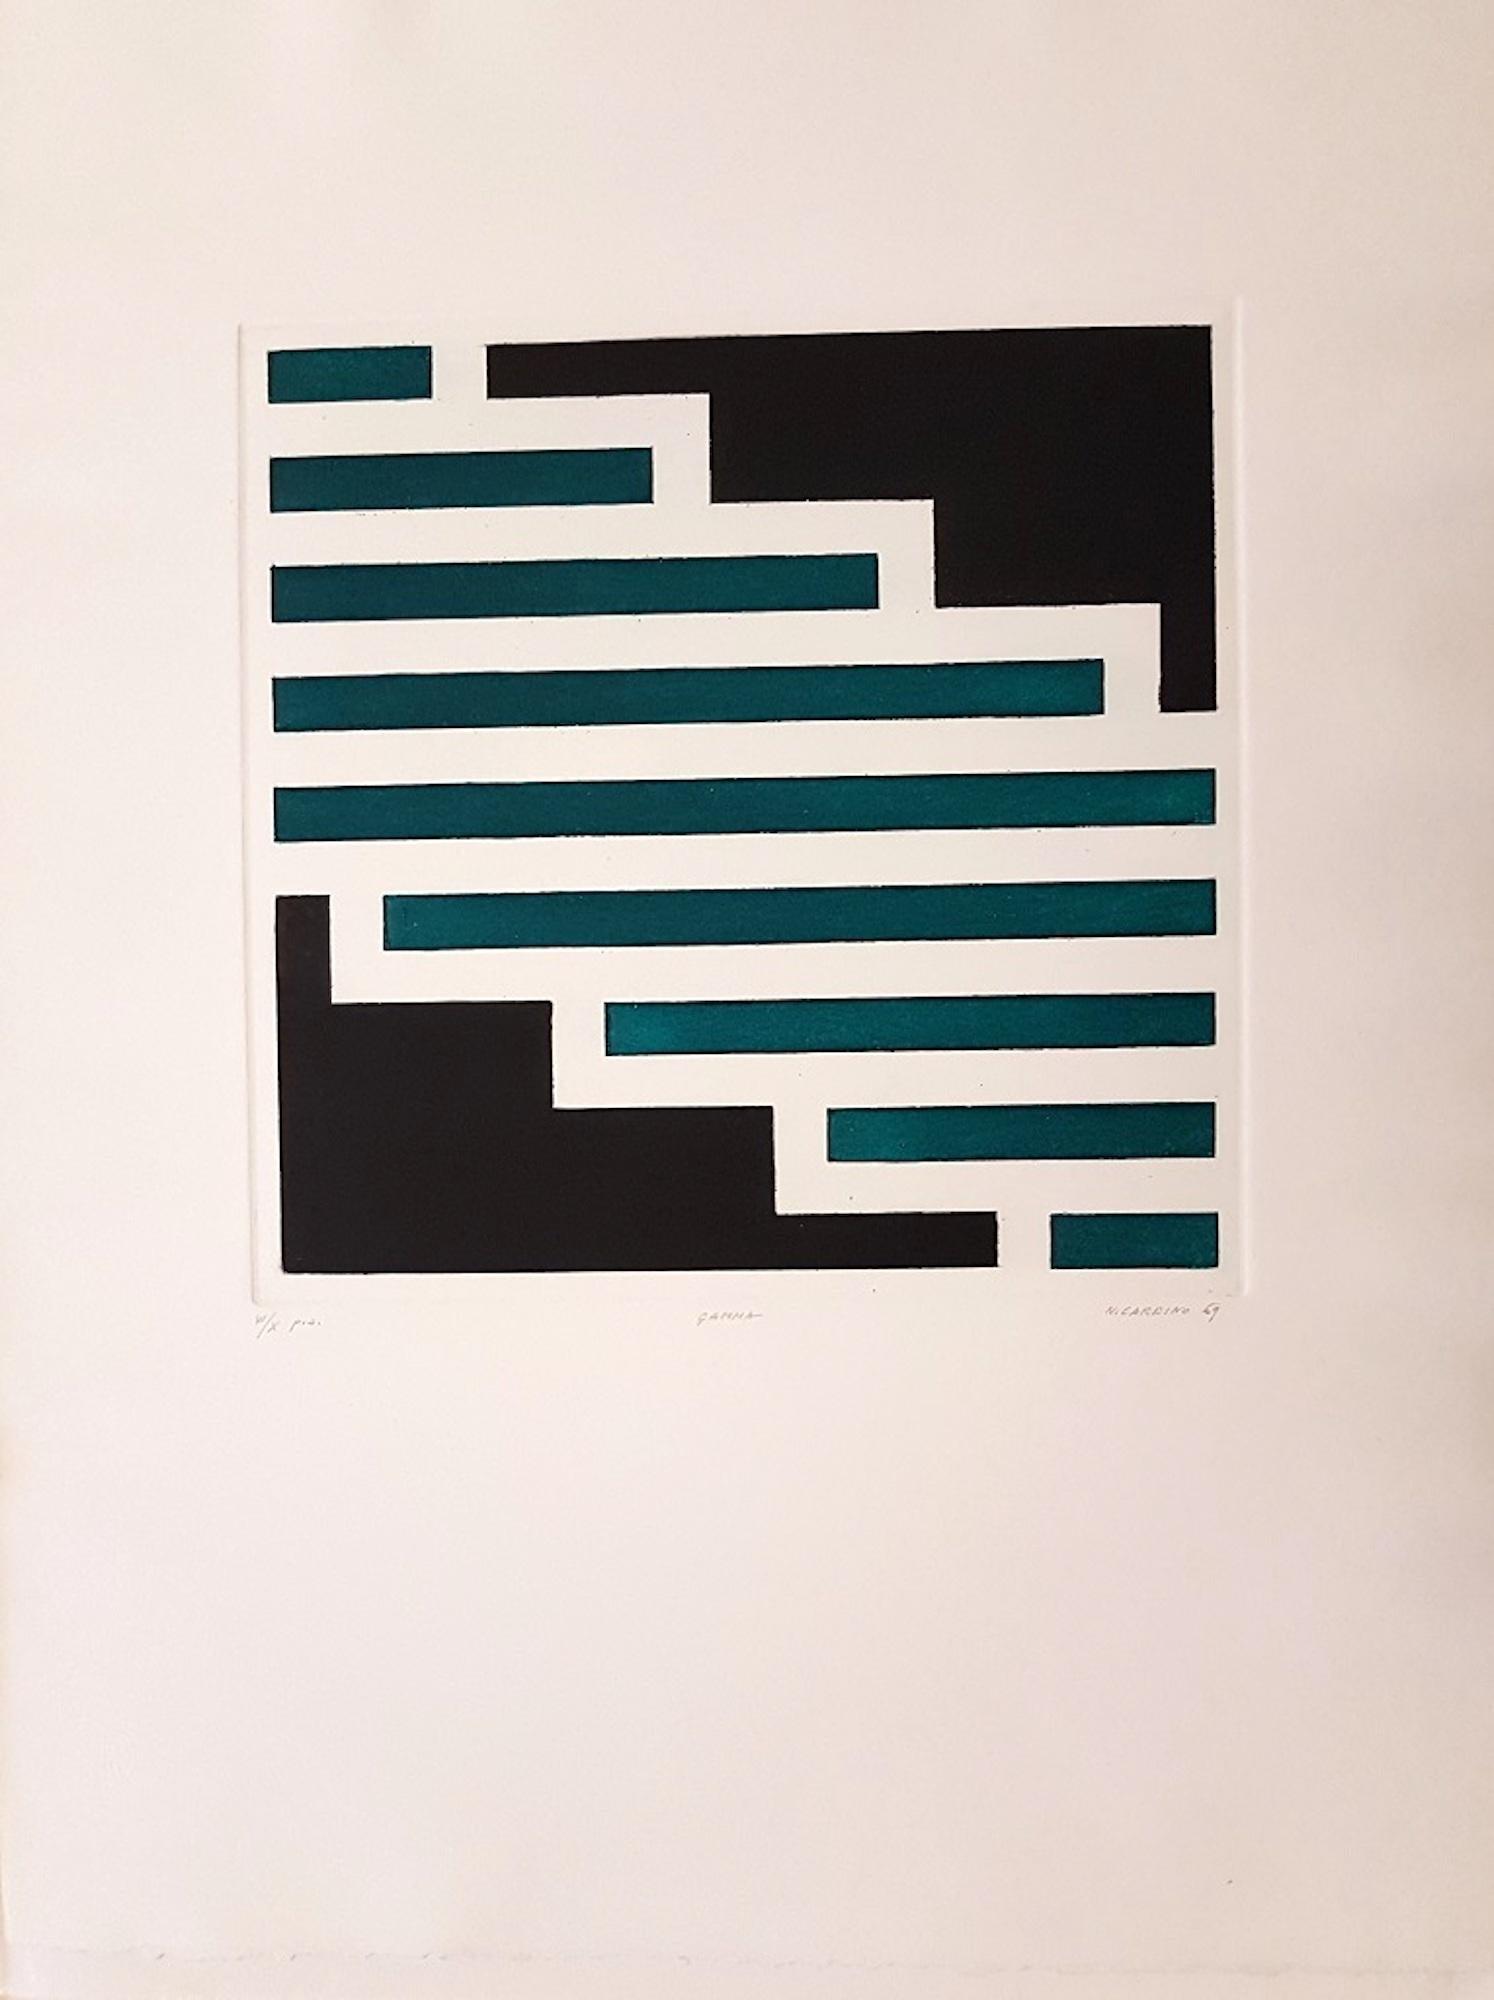 Gamma - Original Etching by Nicola Carrino - 1969